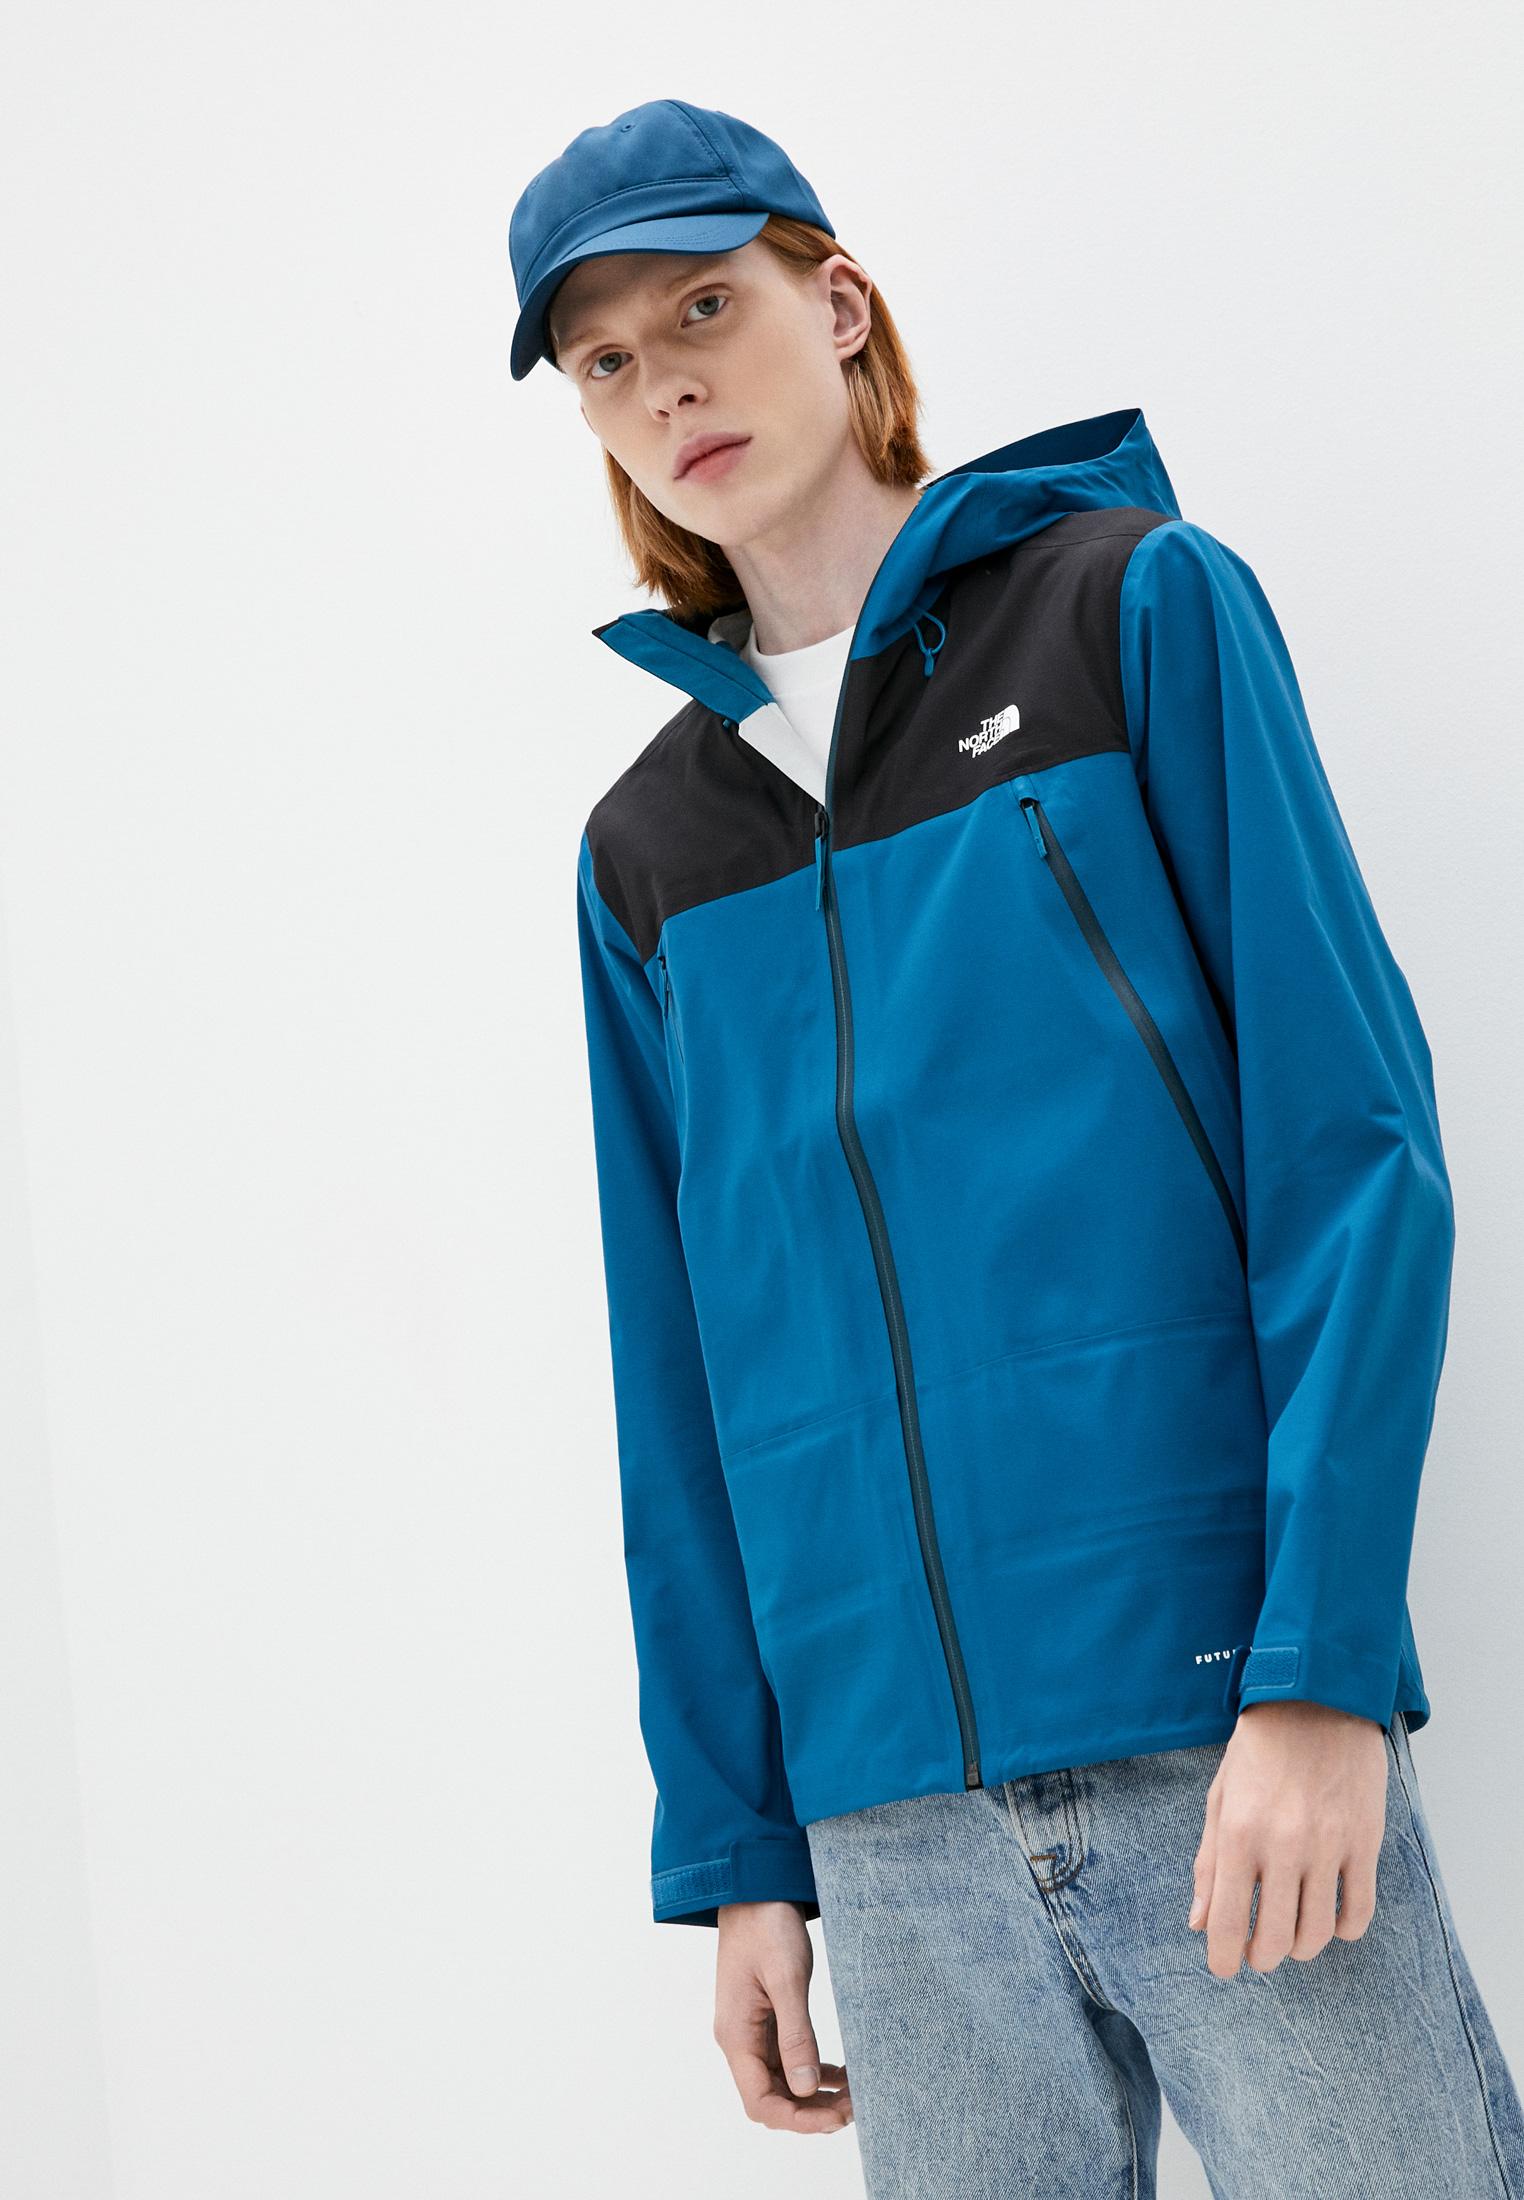 Мужская верхняя одежда The North Face (Норт Фейс) Куртка The North Face